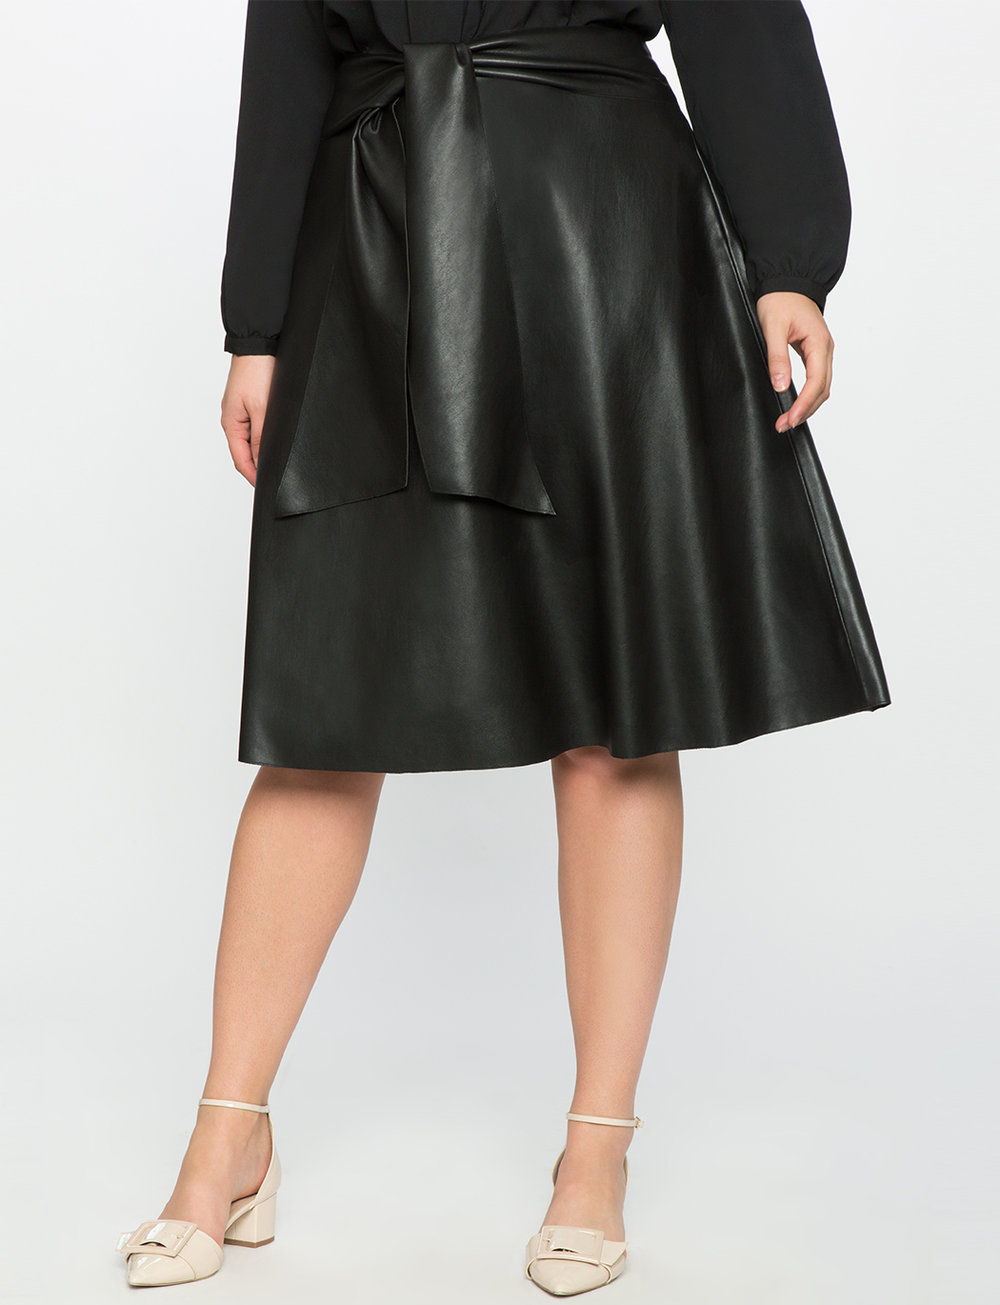 Studio Faux Leather Midi Skirt. Eloquii. $99.